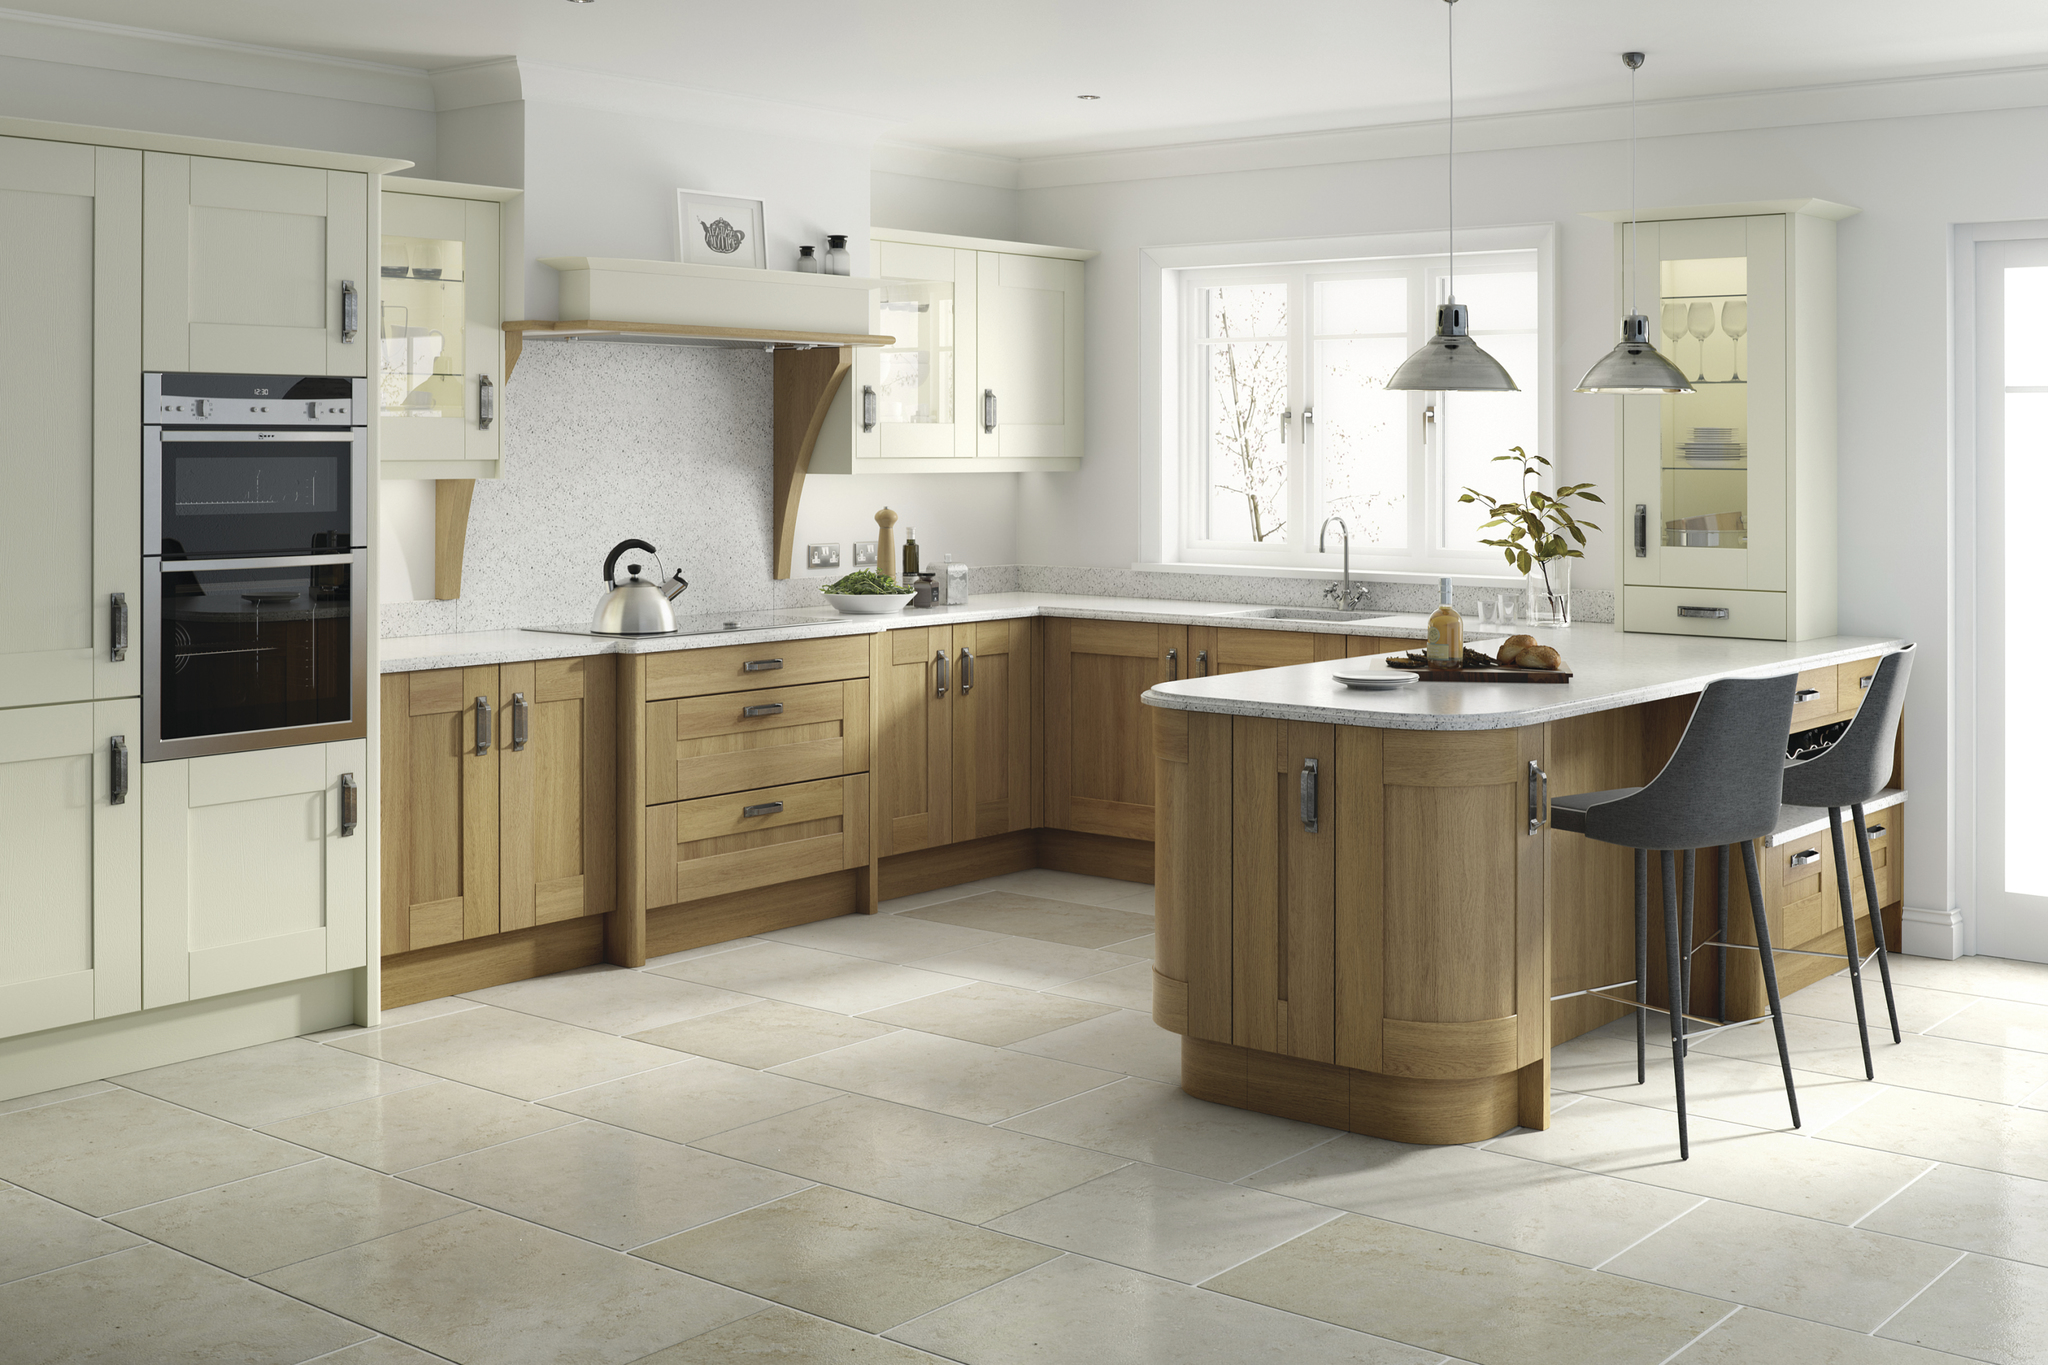 Broadoak £4400 - 24 colour optionsFree Neff oven,hob,hood,Dishwasher+granite Quarts £3950 + installation £2600=Total £10950 Free Consultation!